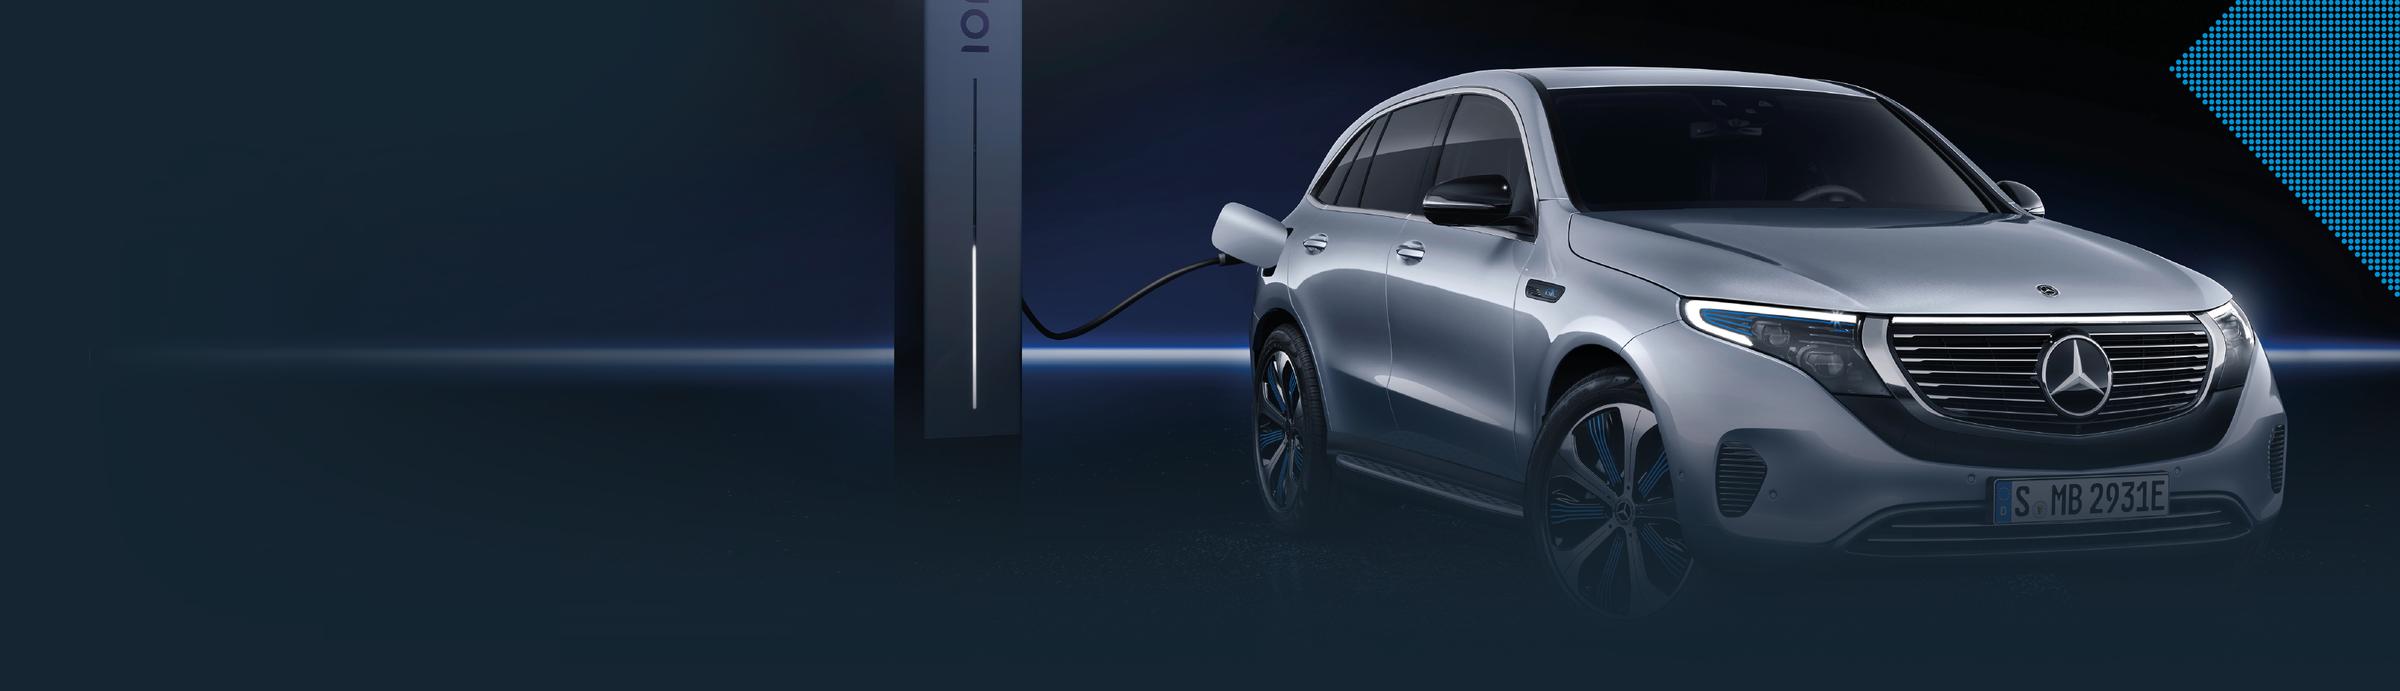 Home - Automotive + eMobilität